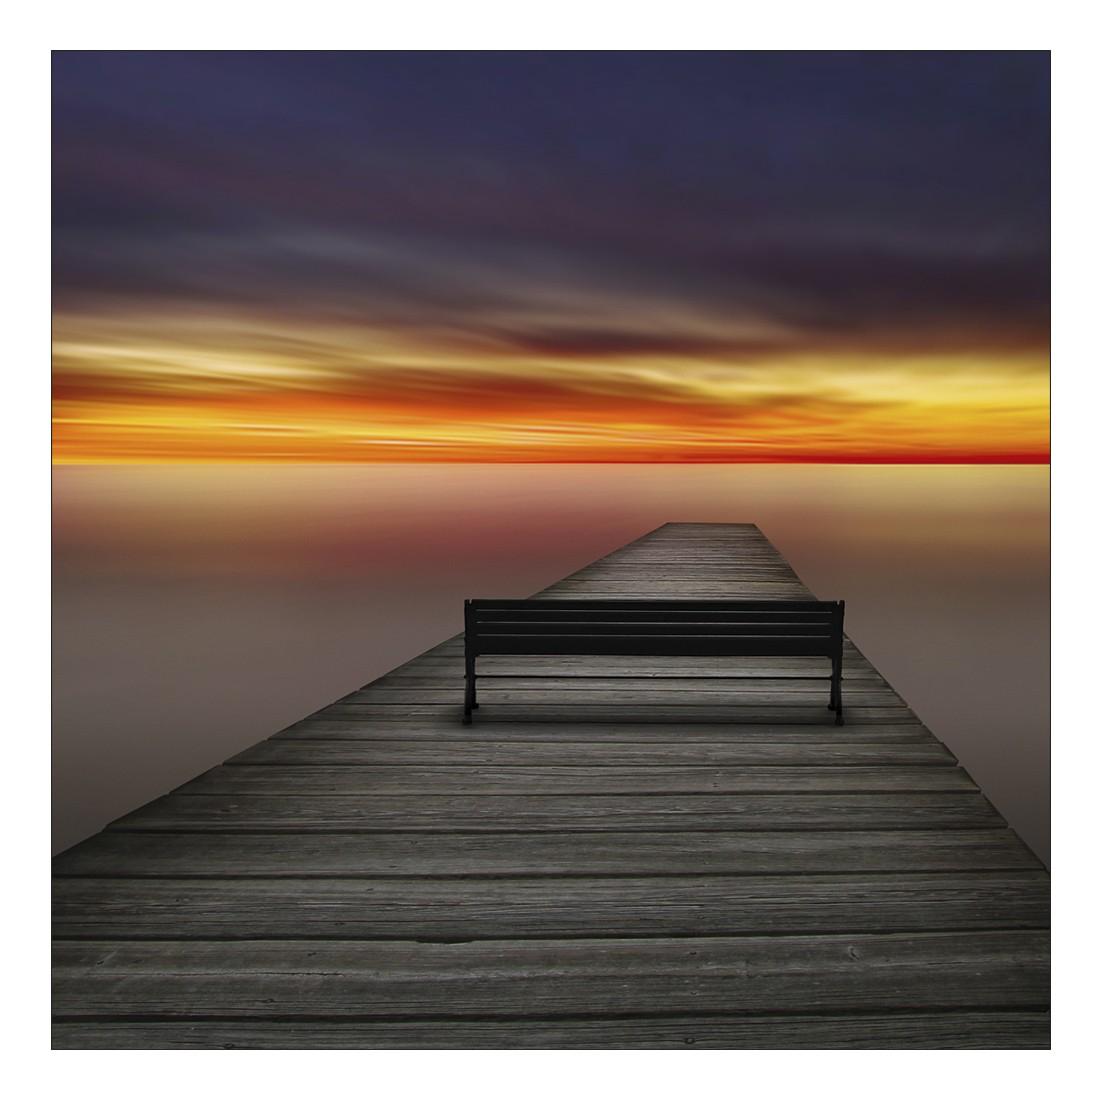 Leinwandbild LOVELY SUNSET PIER BENCH – Abmessung 80 x 80 cm, Gallery of Innovative Art bestellen